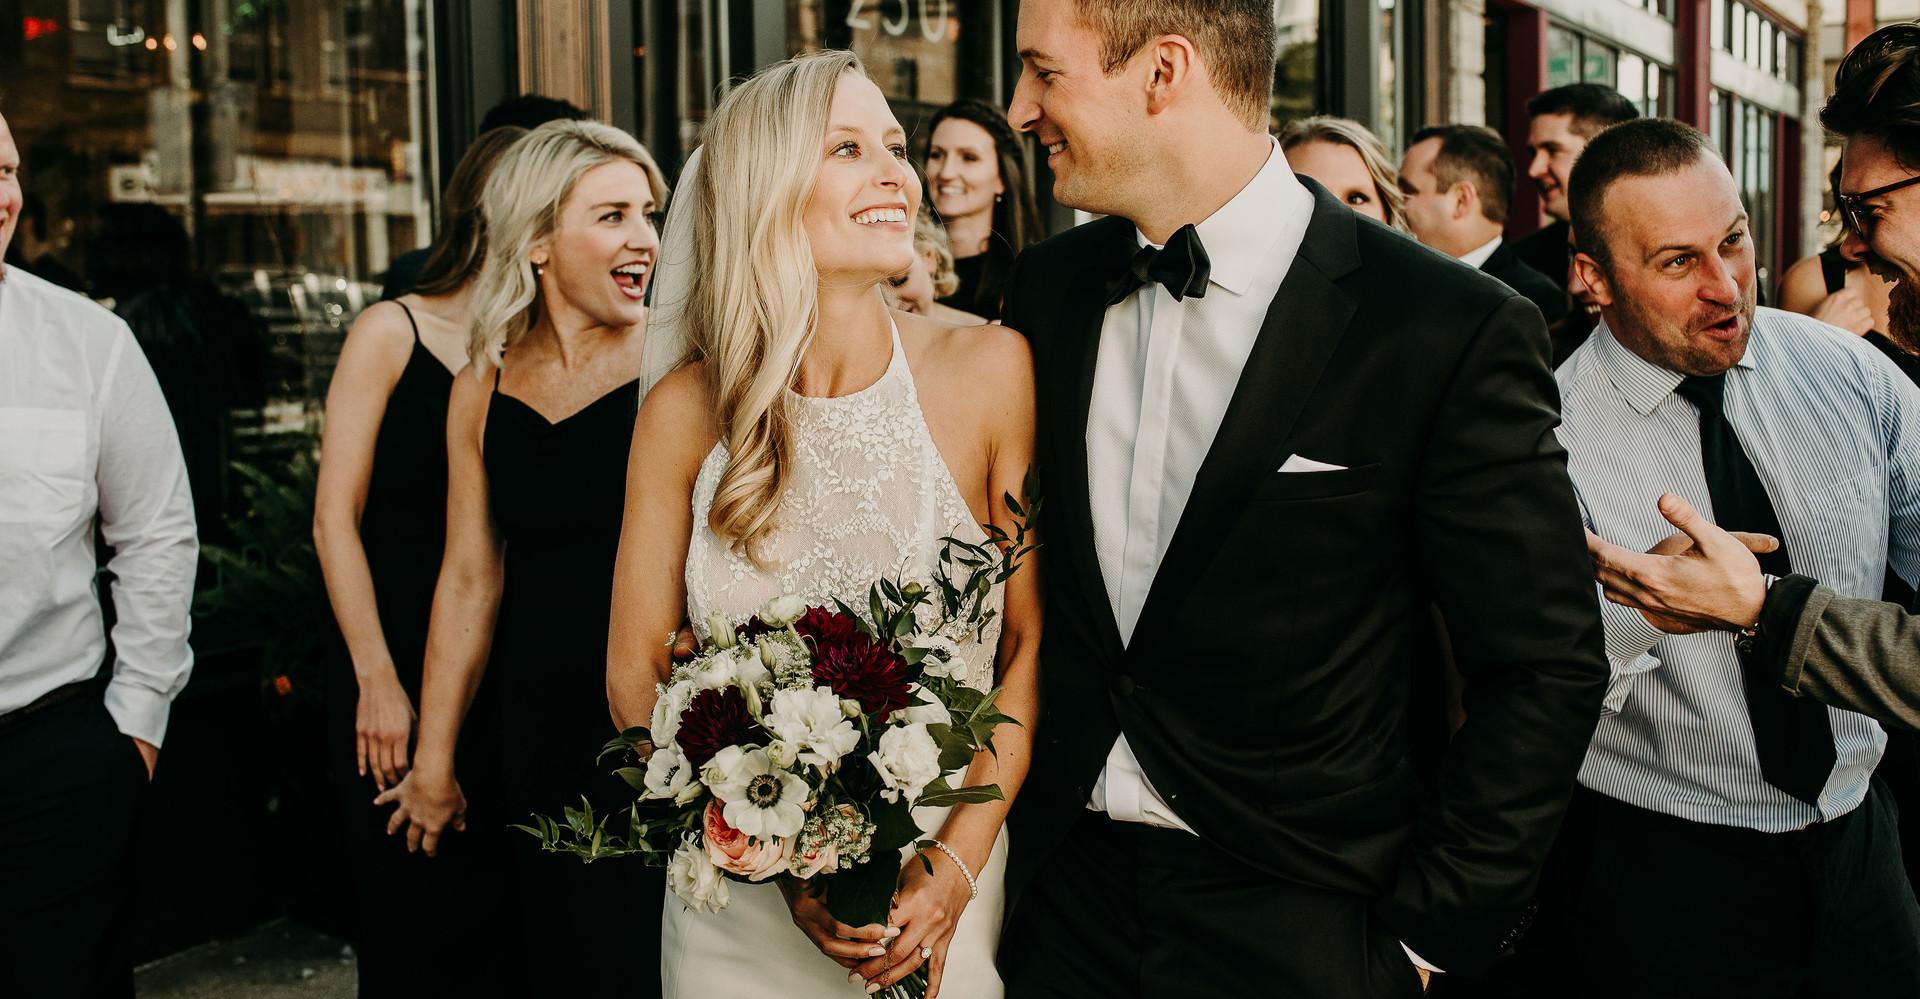 Rachel & Michael having a bit of fun before the reception